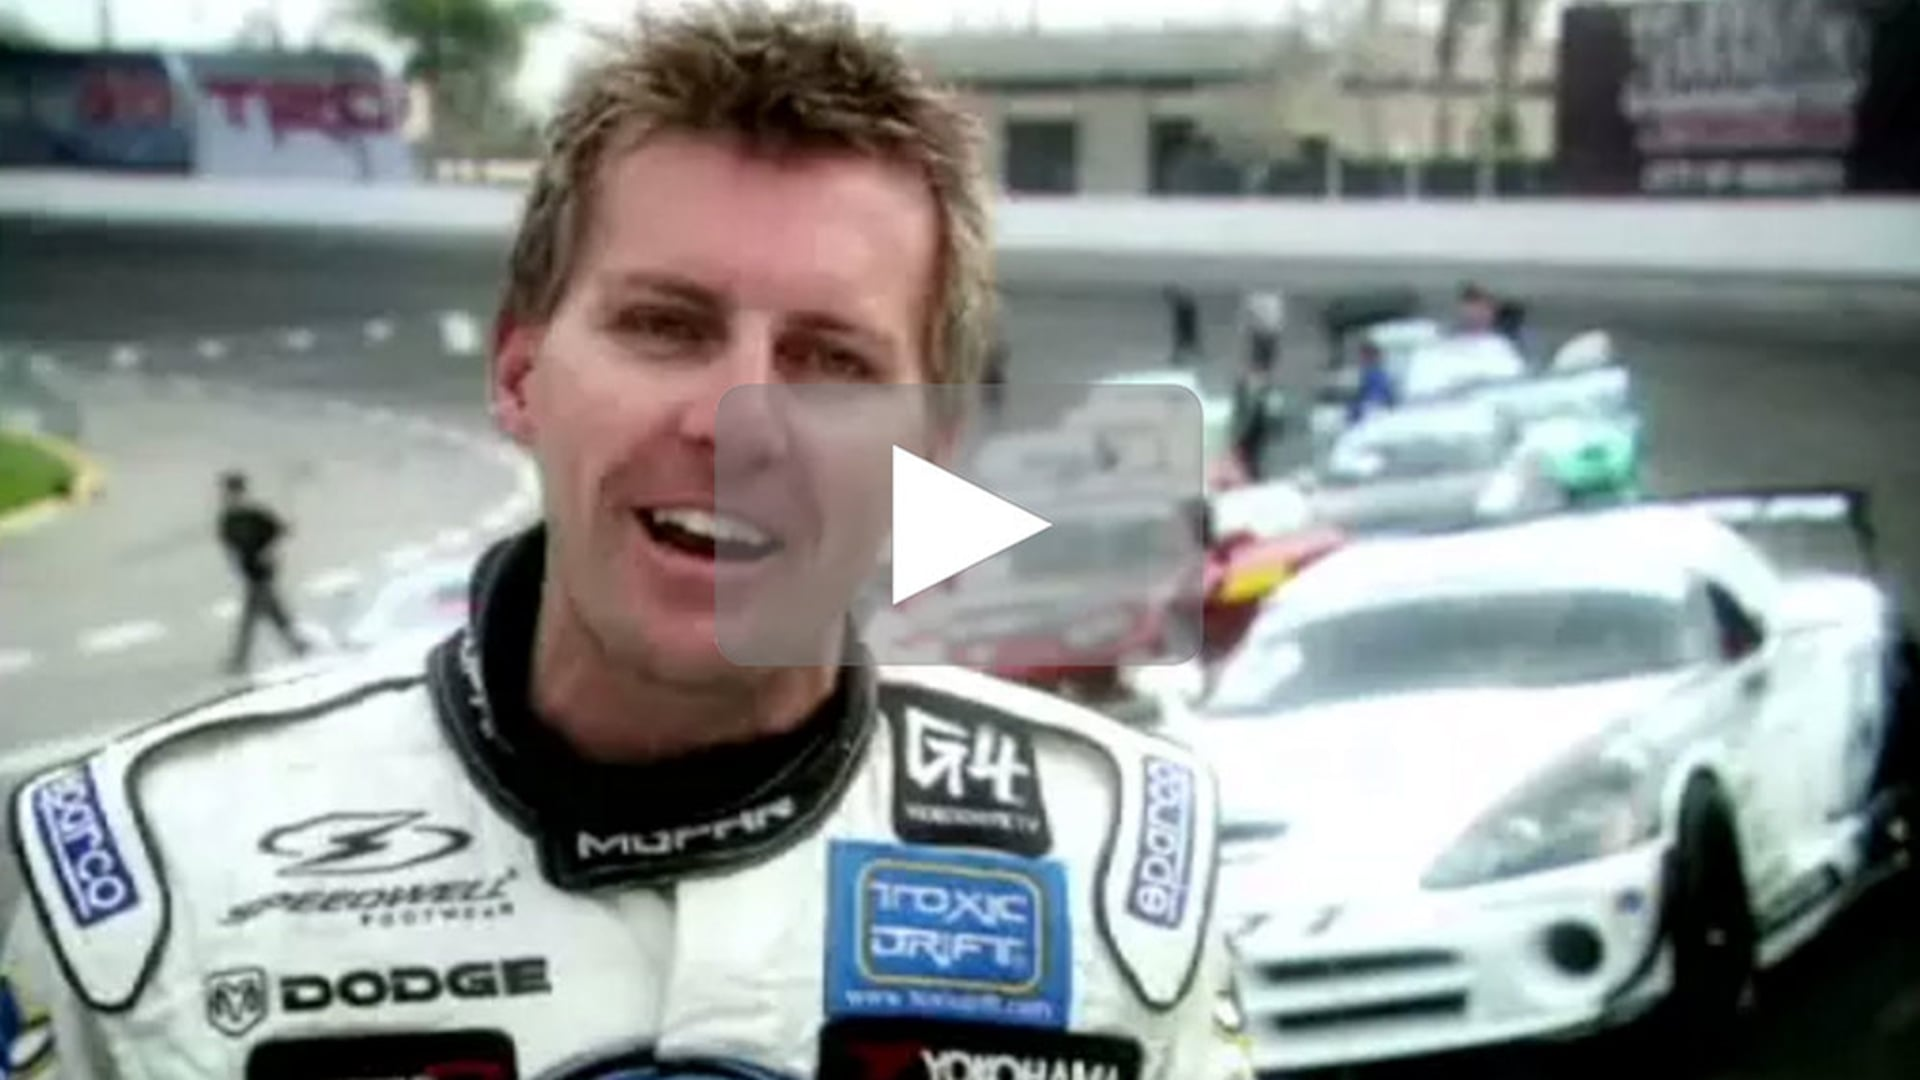 Dodge Mopar Drifting [commercial]